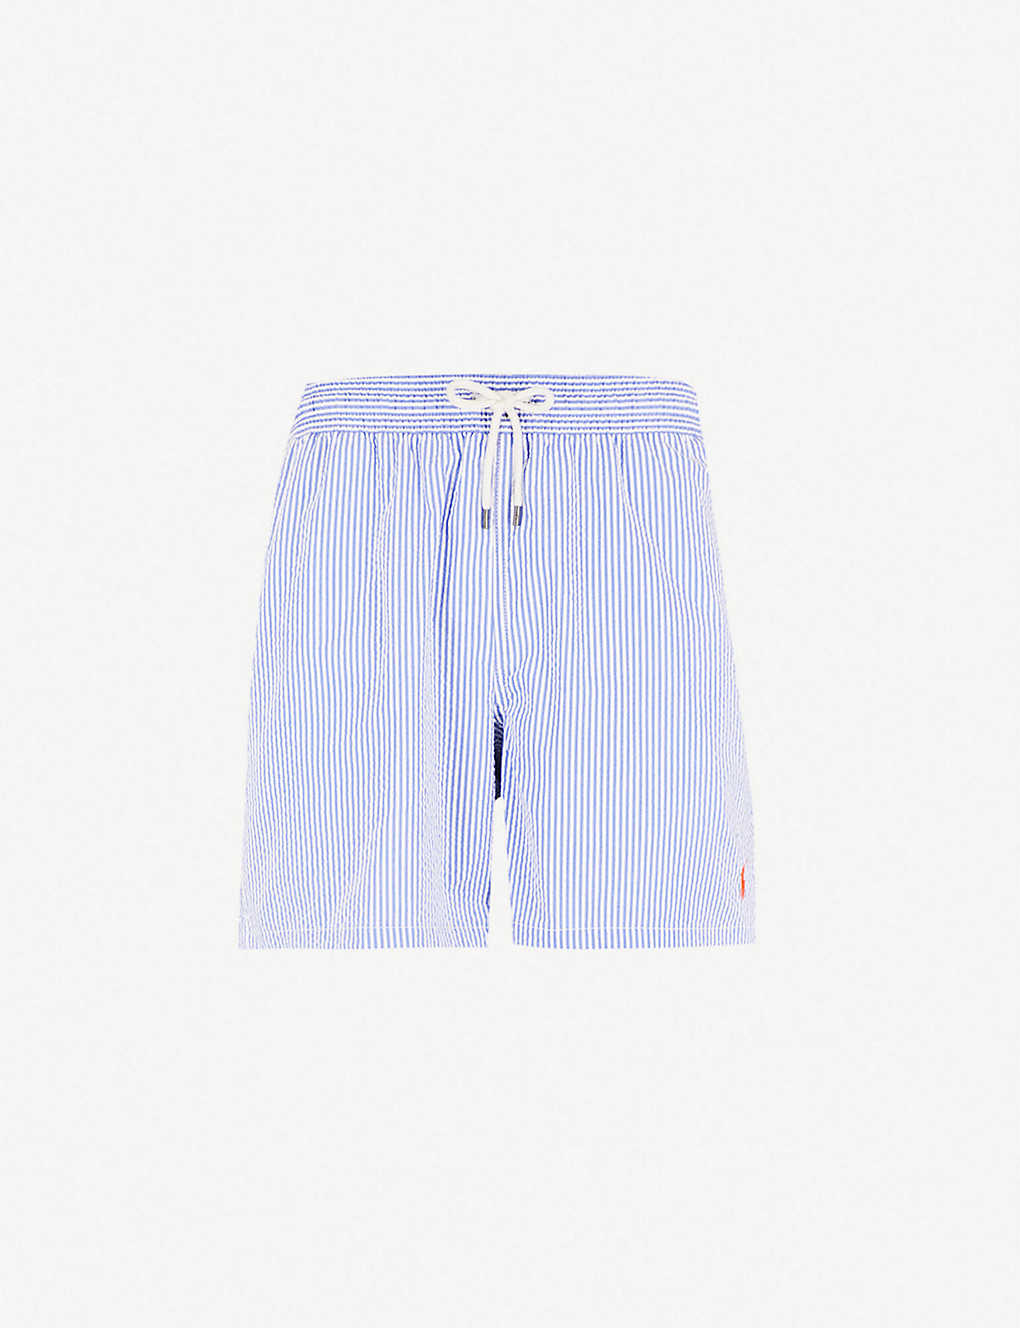 84125778389eb POLO RALPH LAUREN - Traveller striped cotton-blend swim shorts ...